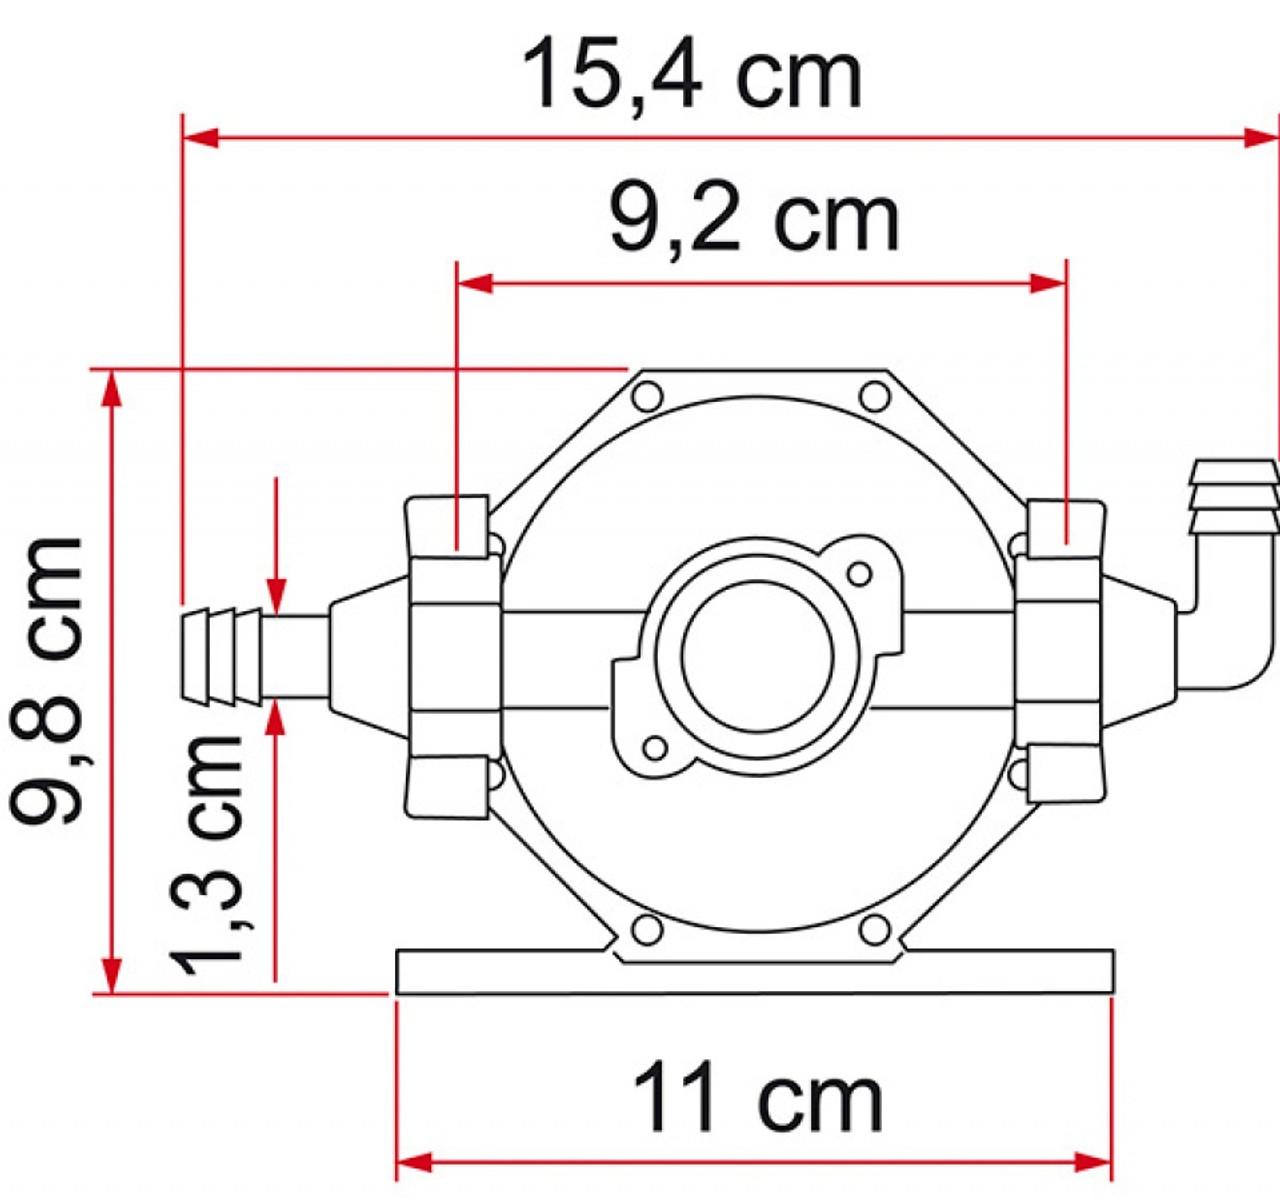 Fiamma A20 Universal Expansion Pump Tank Horizontal Measurements